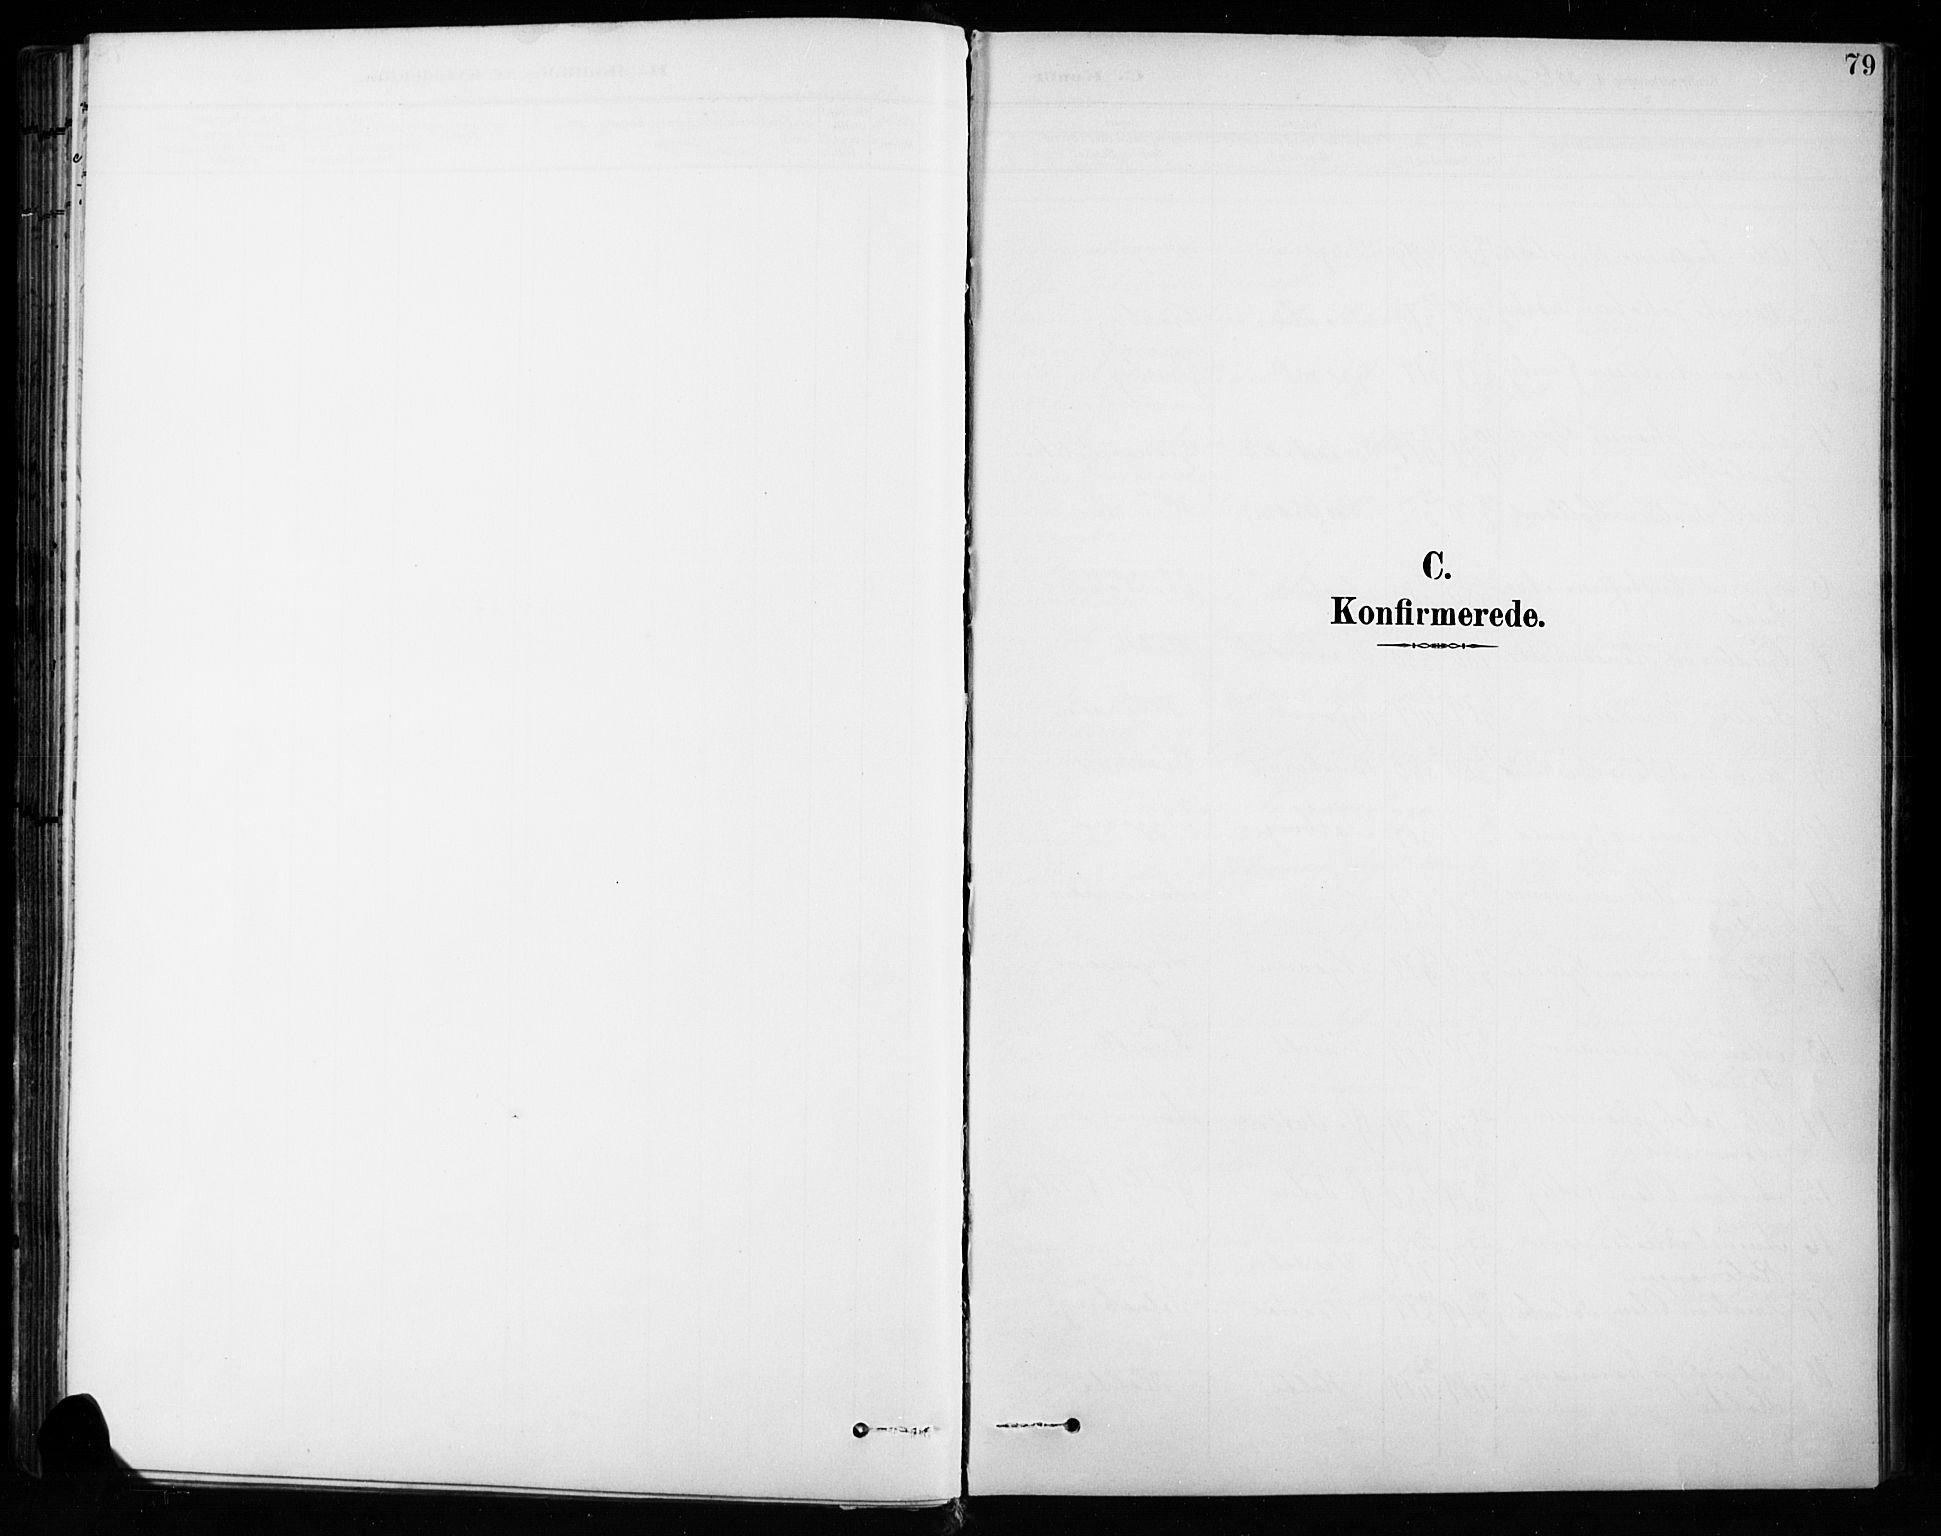 SAH, Vardal prestekontor, H/Ha/Hab/L0010: Klokkerbok nr. 10, 1895-1903, s. 79